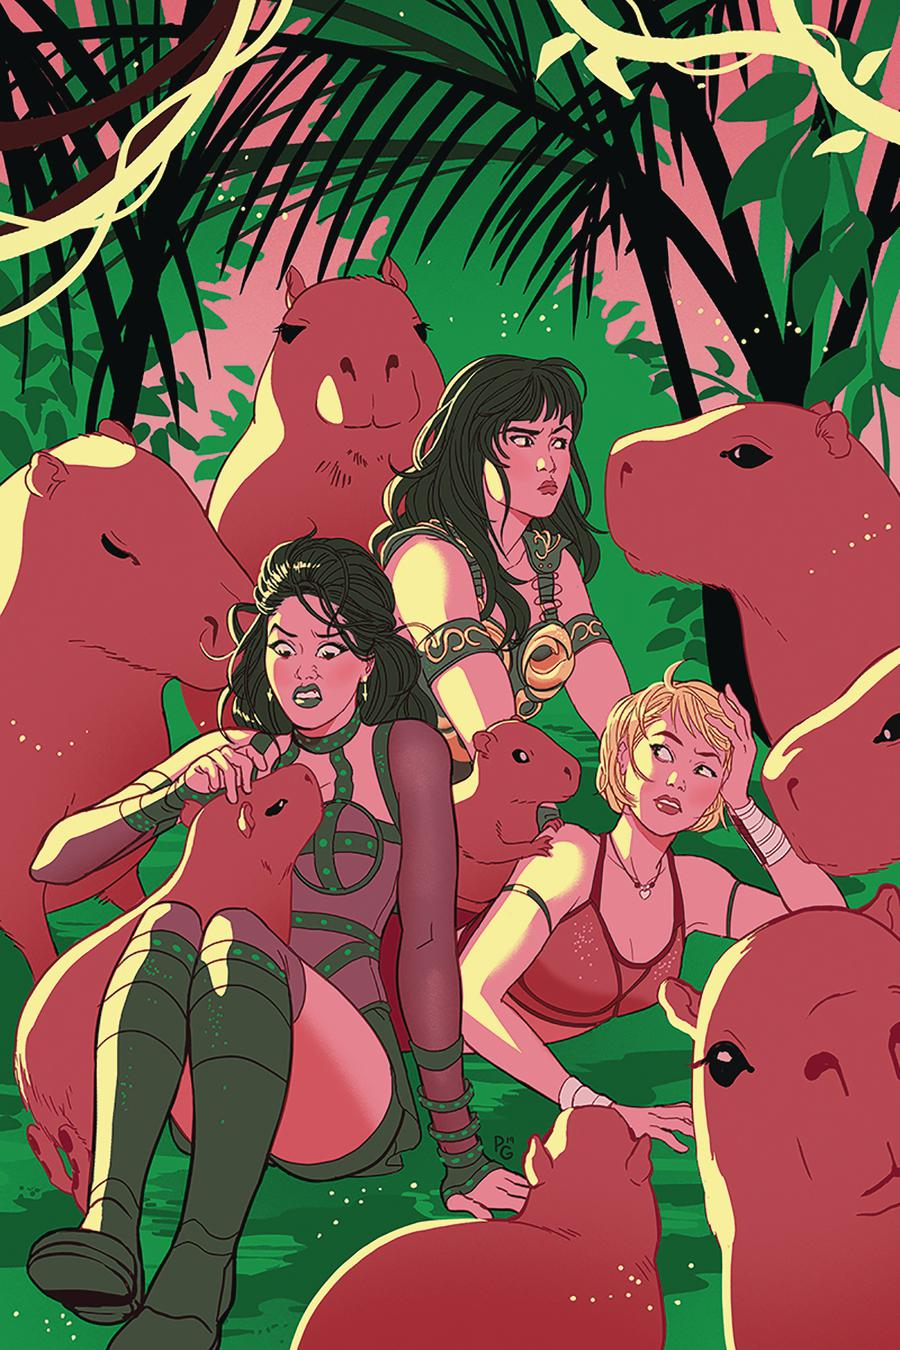 Xena Warrior Princess Vol 4 #3 Cover F Incentive Paulina Ganucheau Virgin Cover